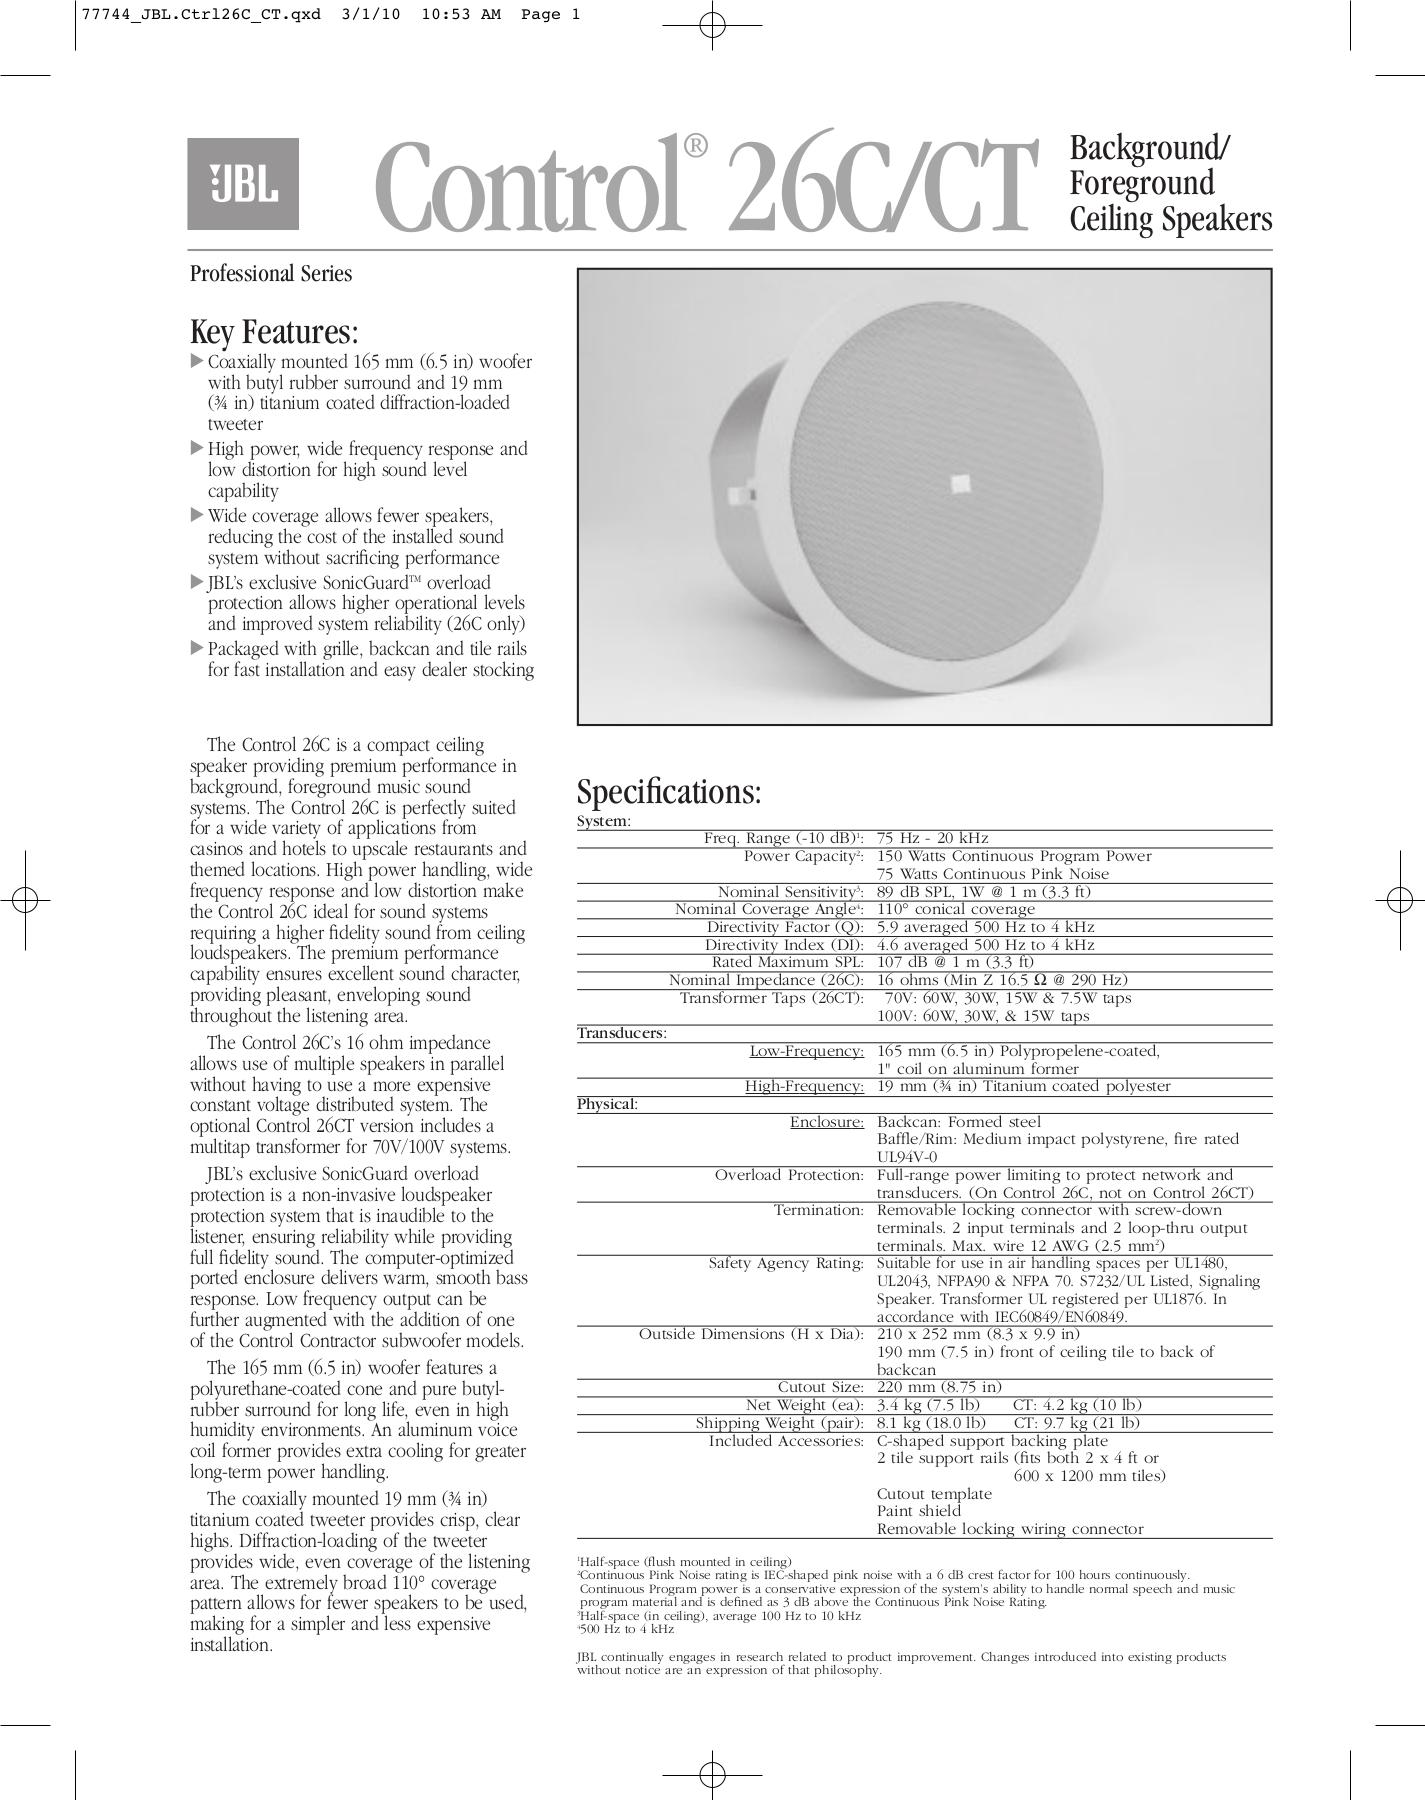 Jbl Mr826 Manualpdf T Score Table For Ecbi Mack Mr Wiring Diagram Tundra Radio Harness Get Free Image About